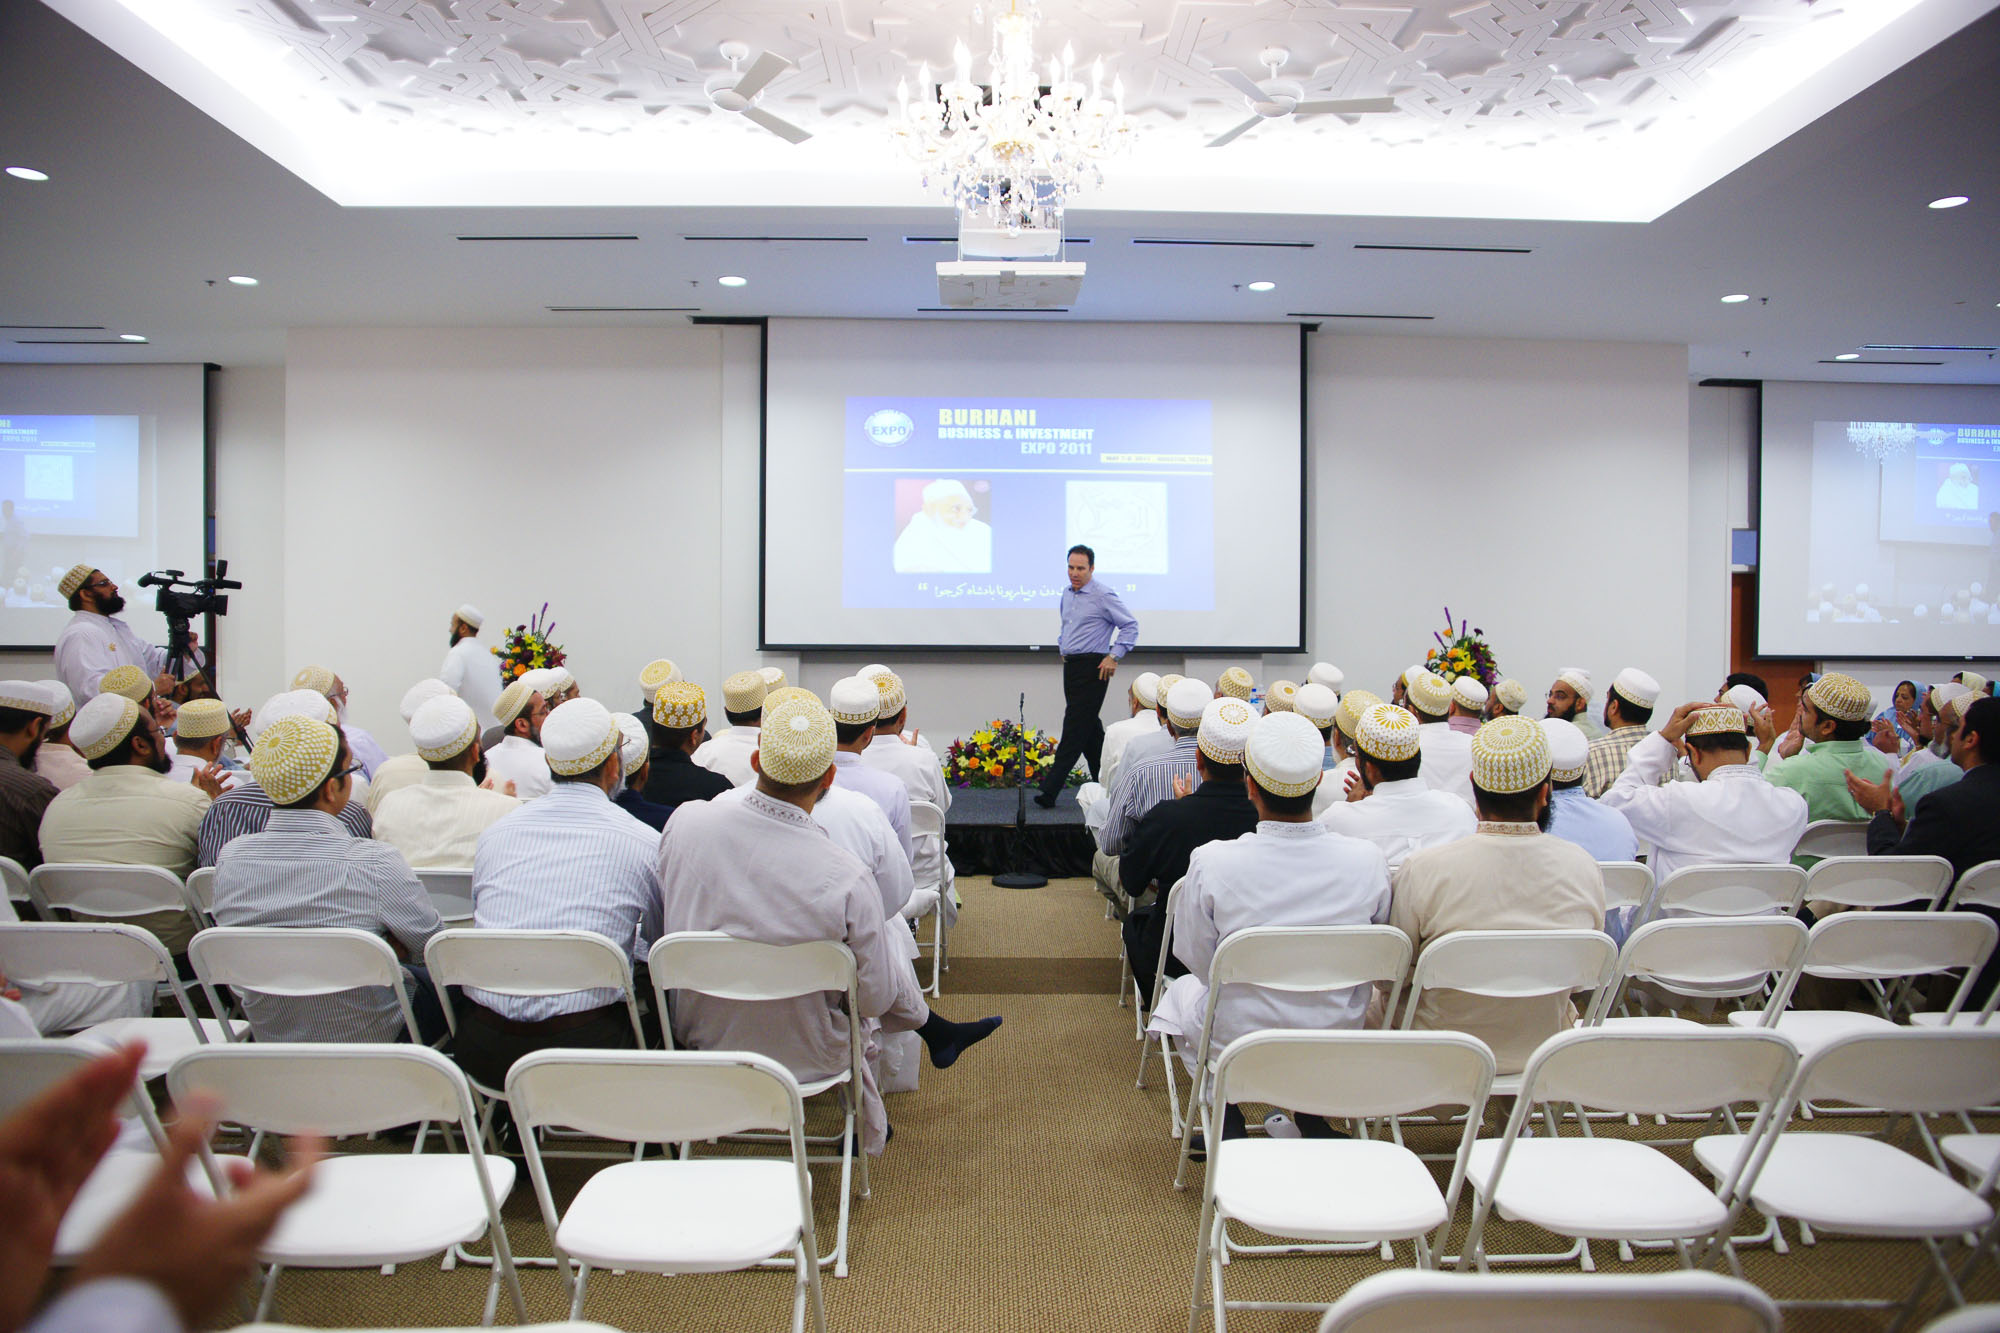 BBCC Houston Business Expo 2011album-16976409-downloads-pt1.JPG